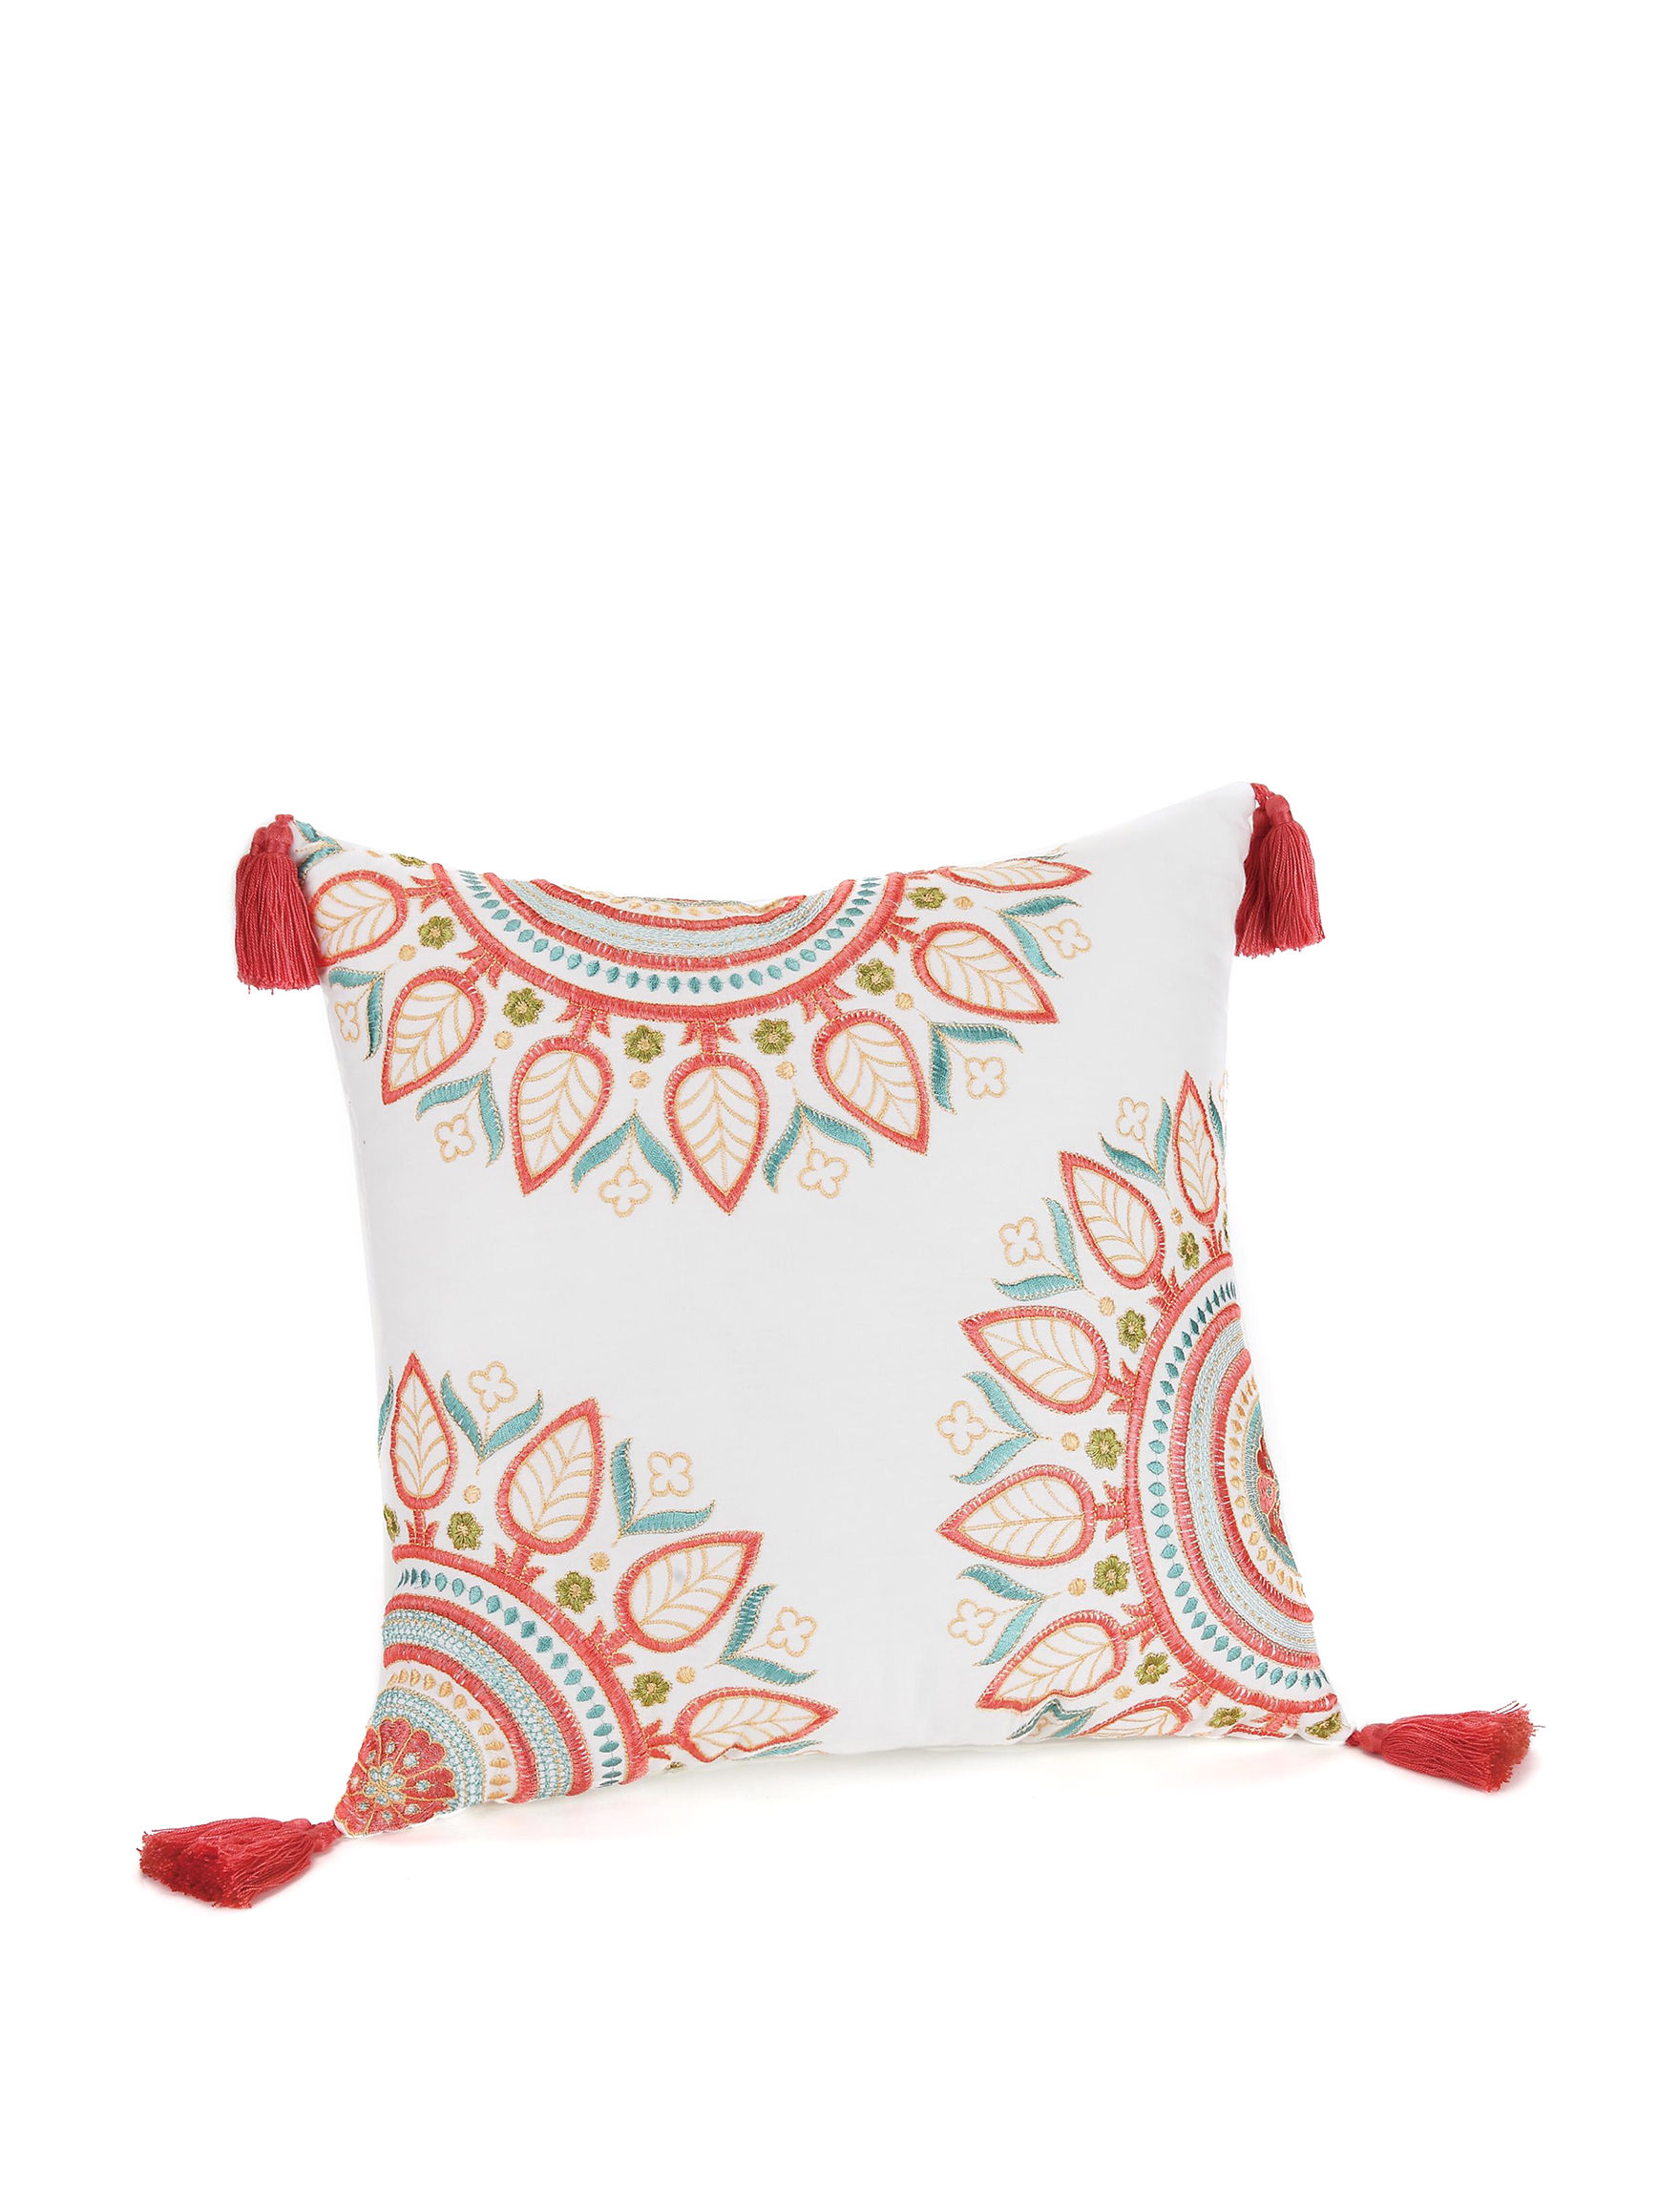 Jessica Simpson Multi Decorative Pillows